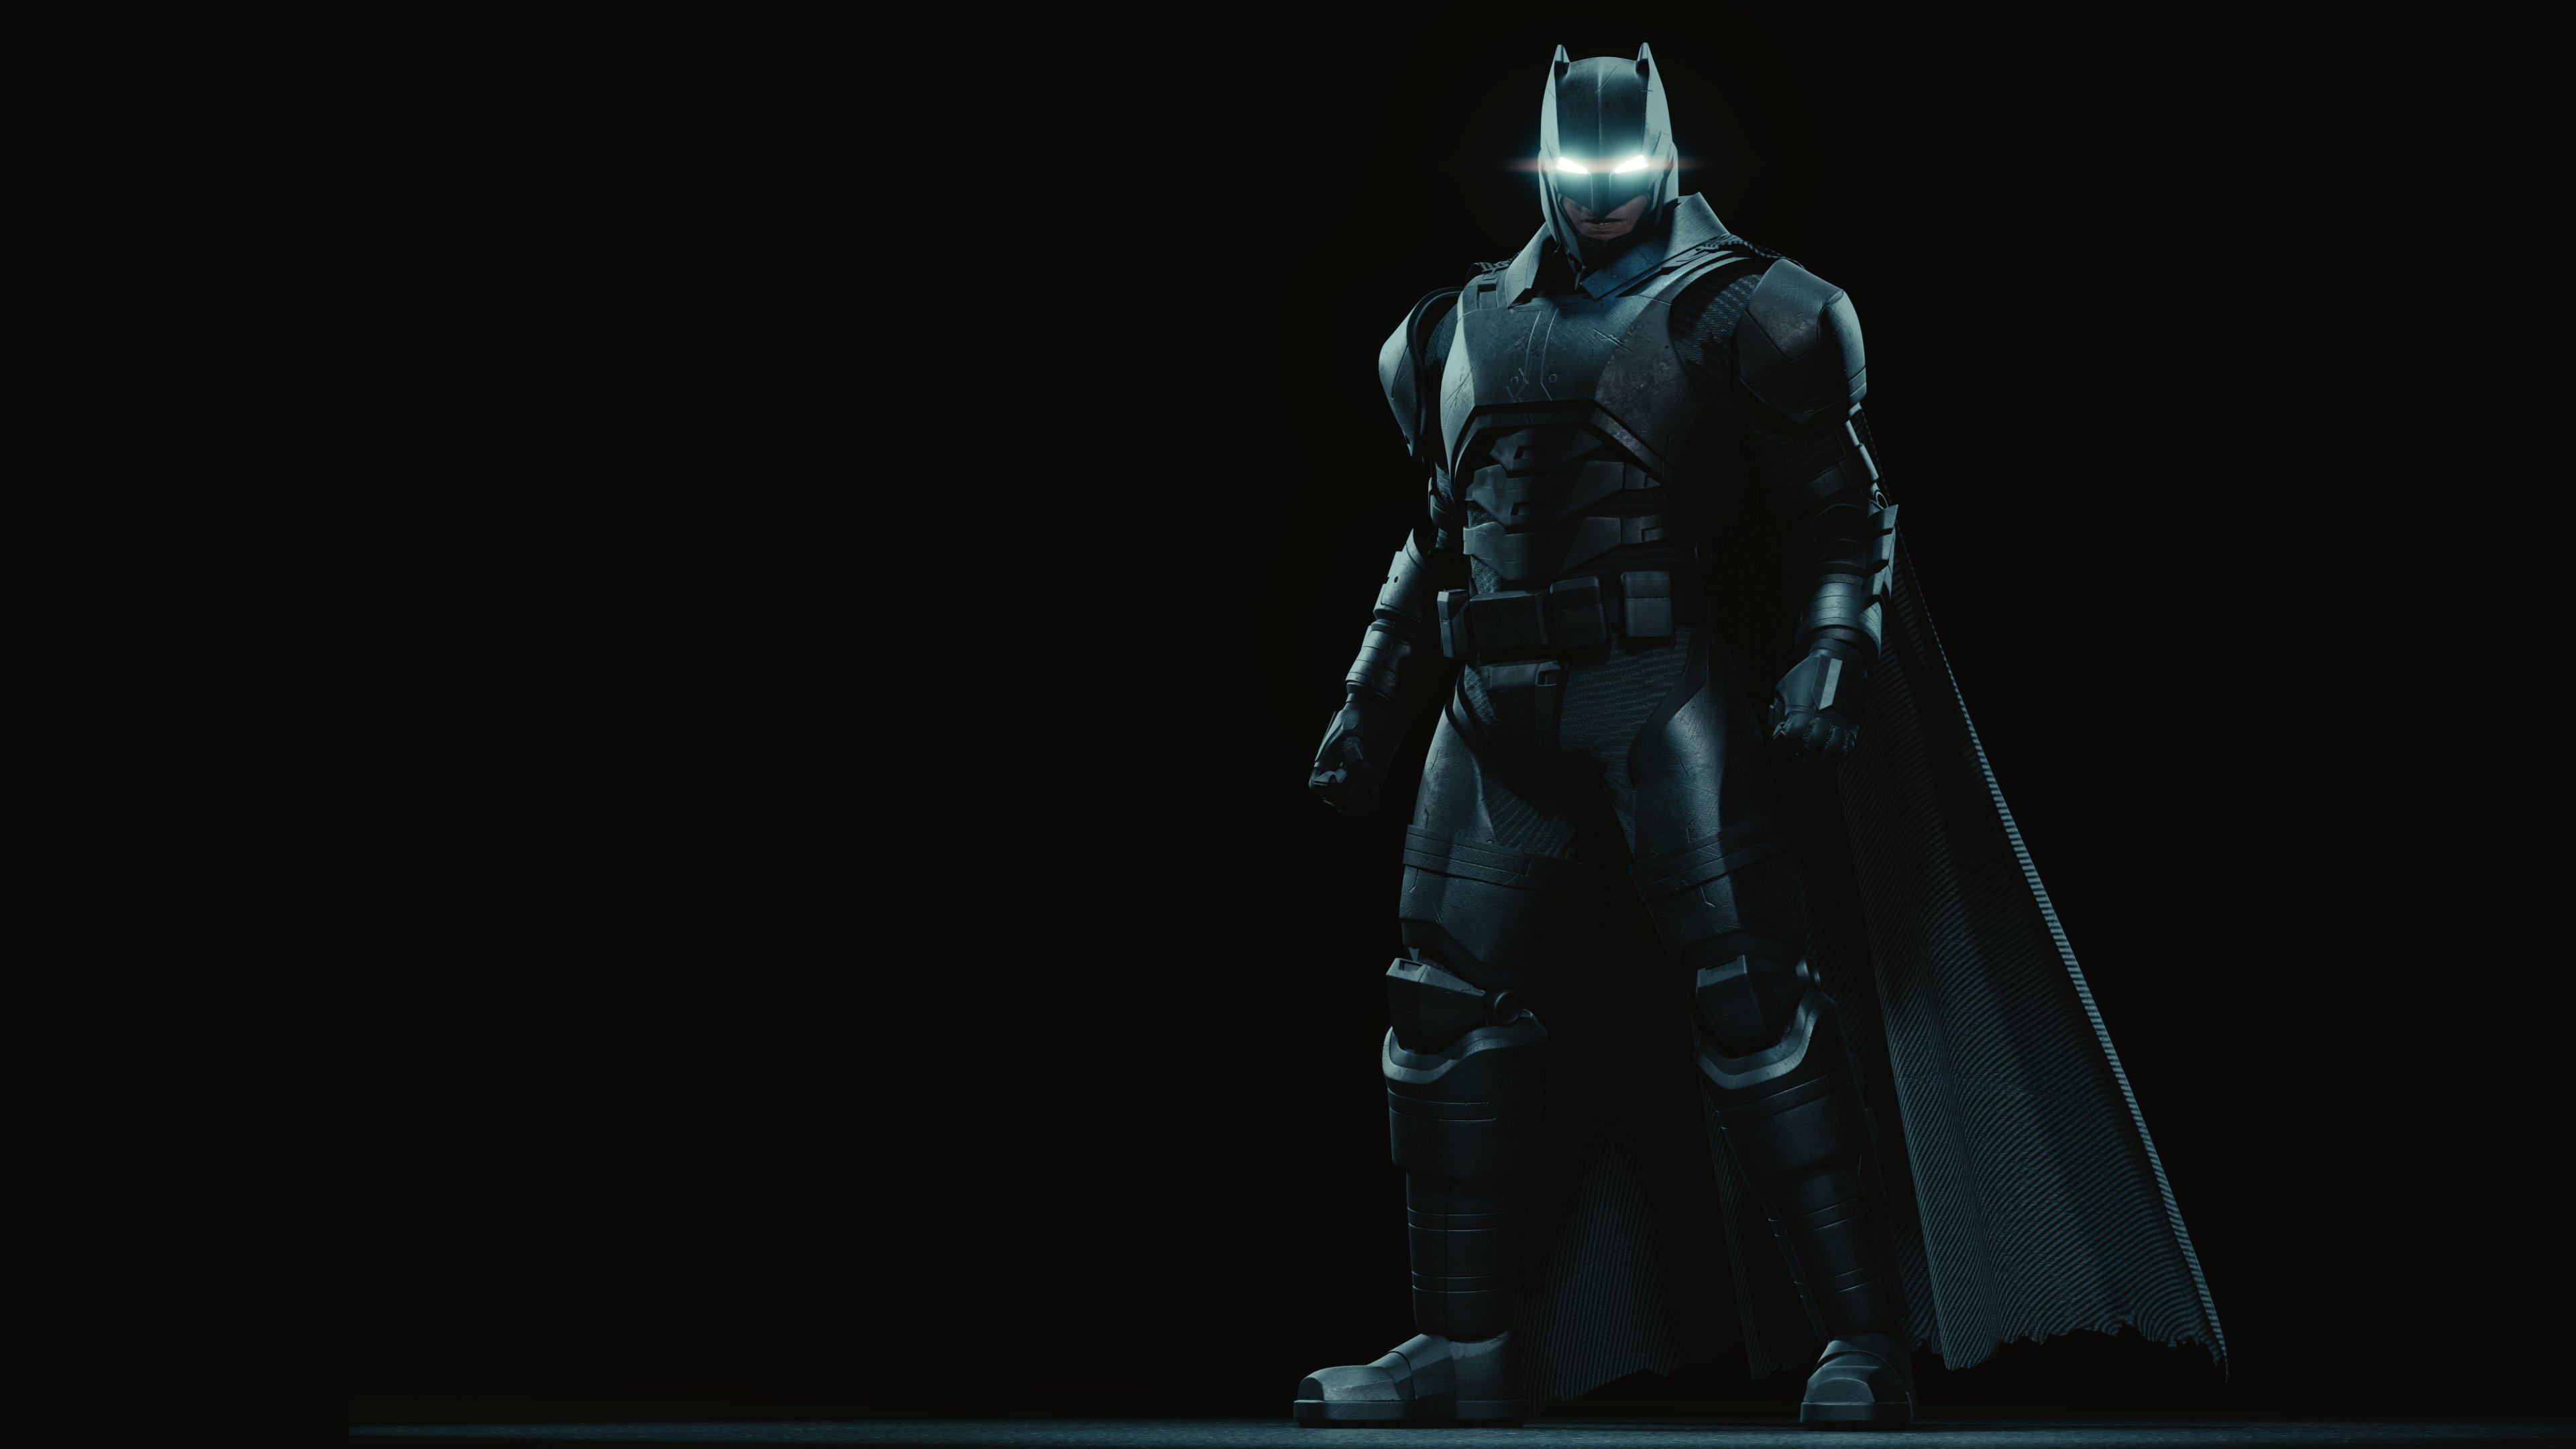 batman armoured 1536522734 - Batman Armoured - superheroes wallpapers, hd-wallpapers, digital art wallpapers, batman wallpapers, artwork wallpapers, artist wallpapers, 4k-wallpapers